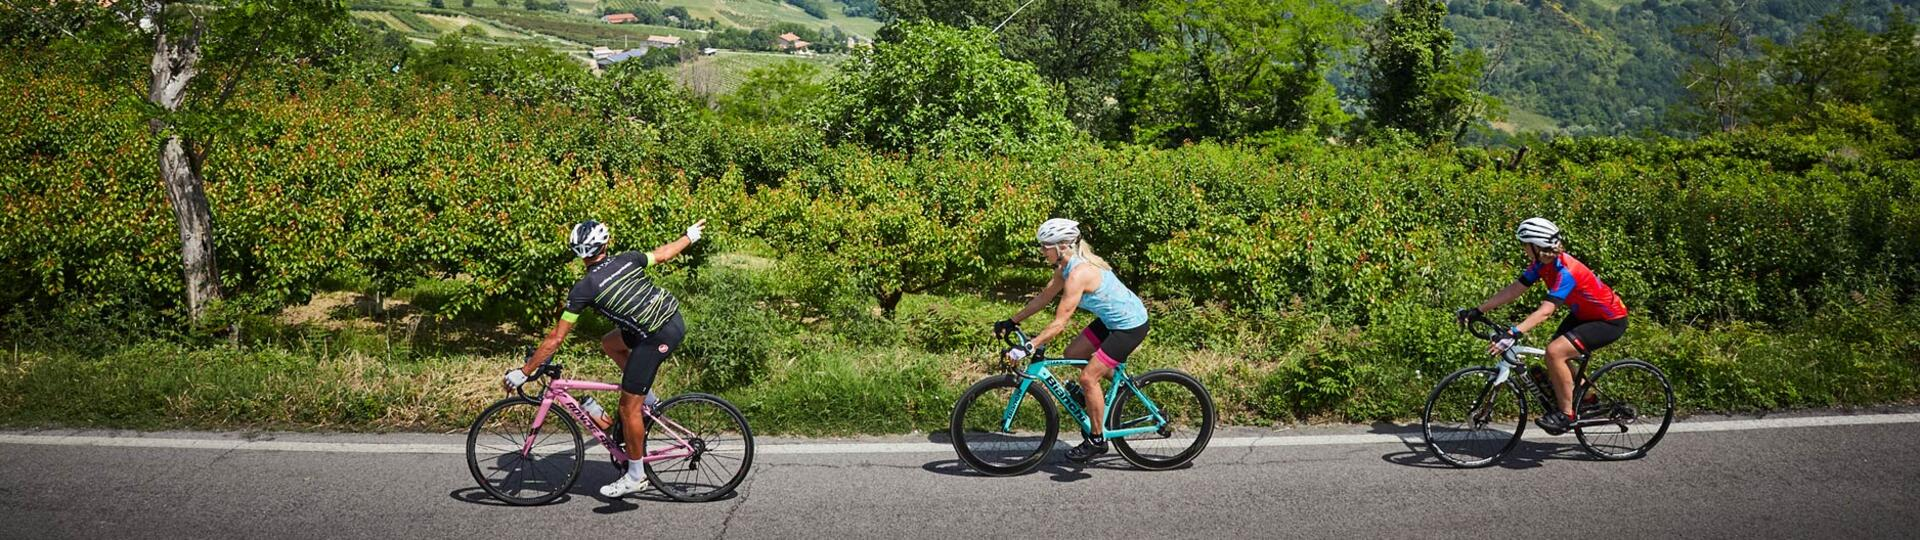 cycling.oxygenhotel it percorsi-bici-da-strada-rimini 012